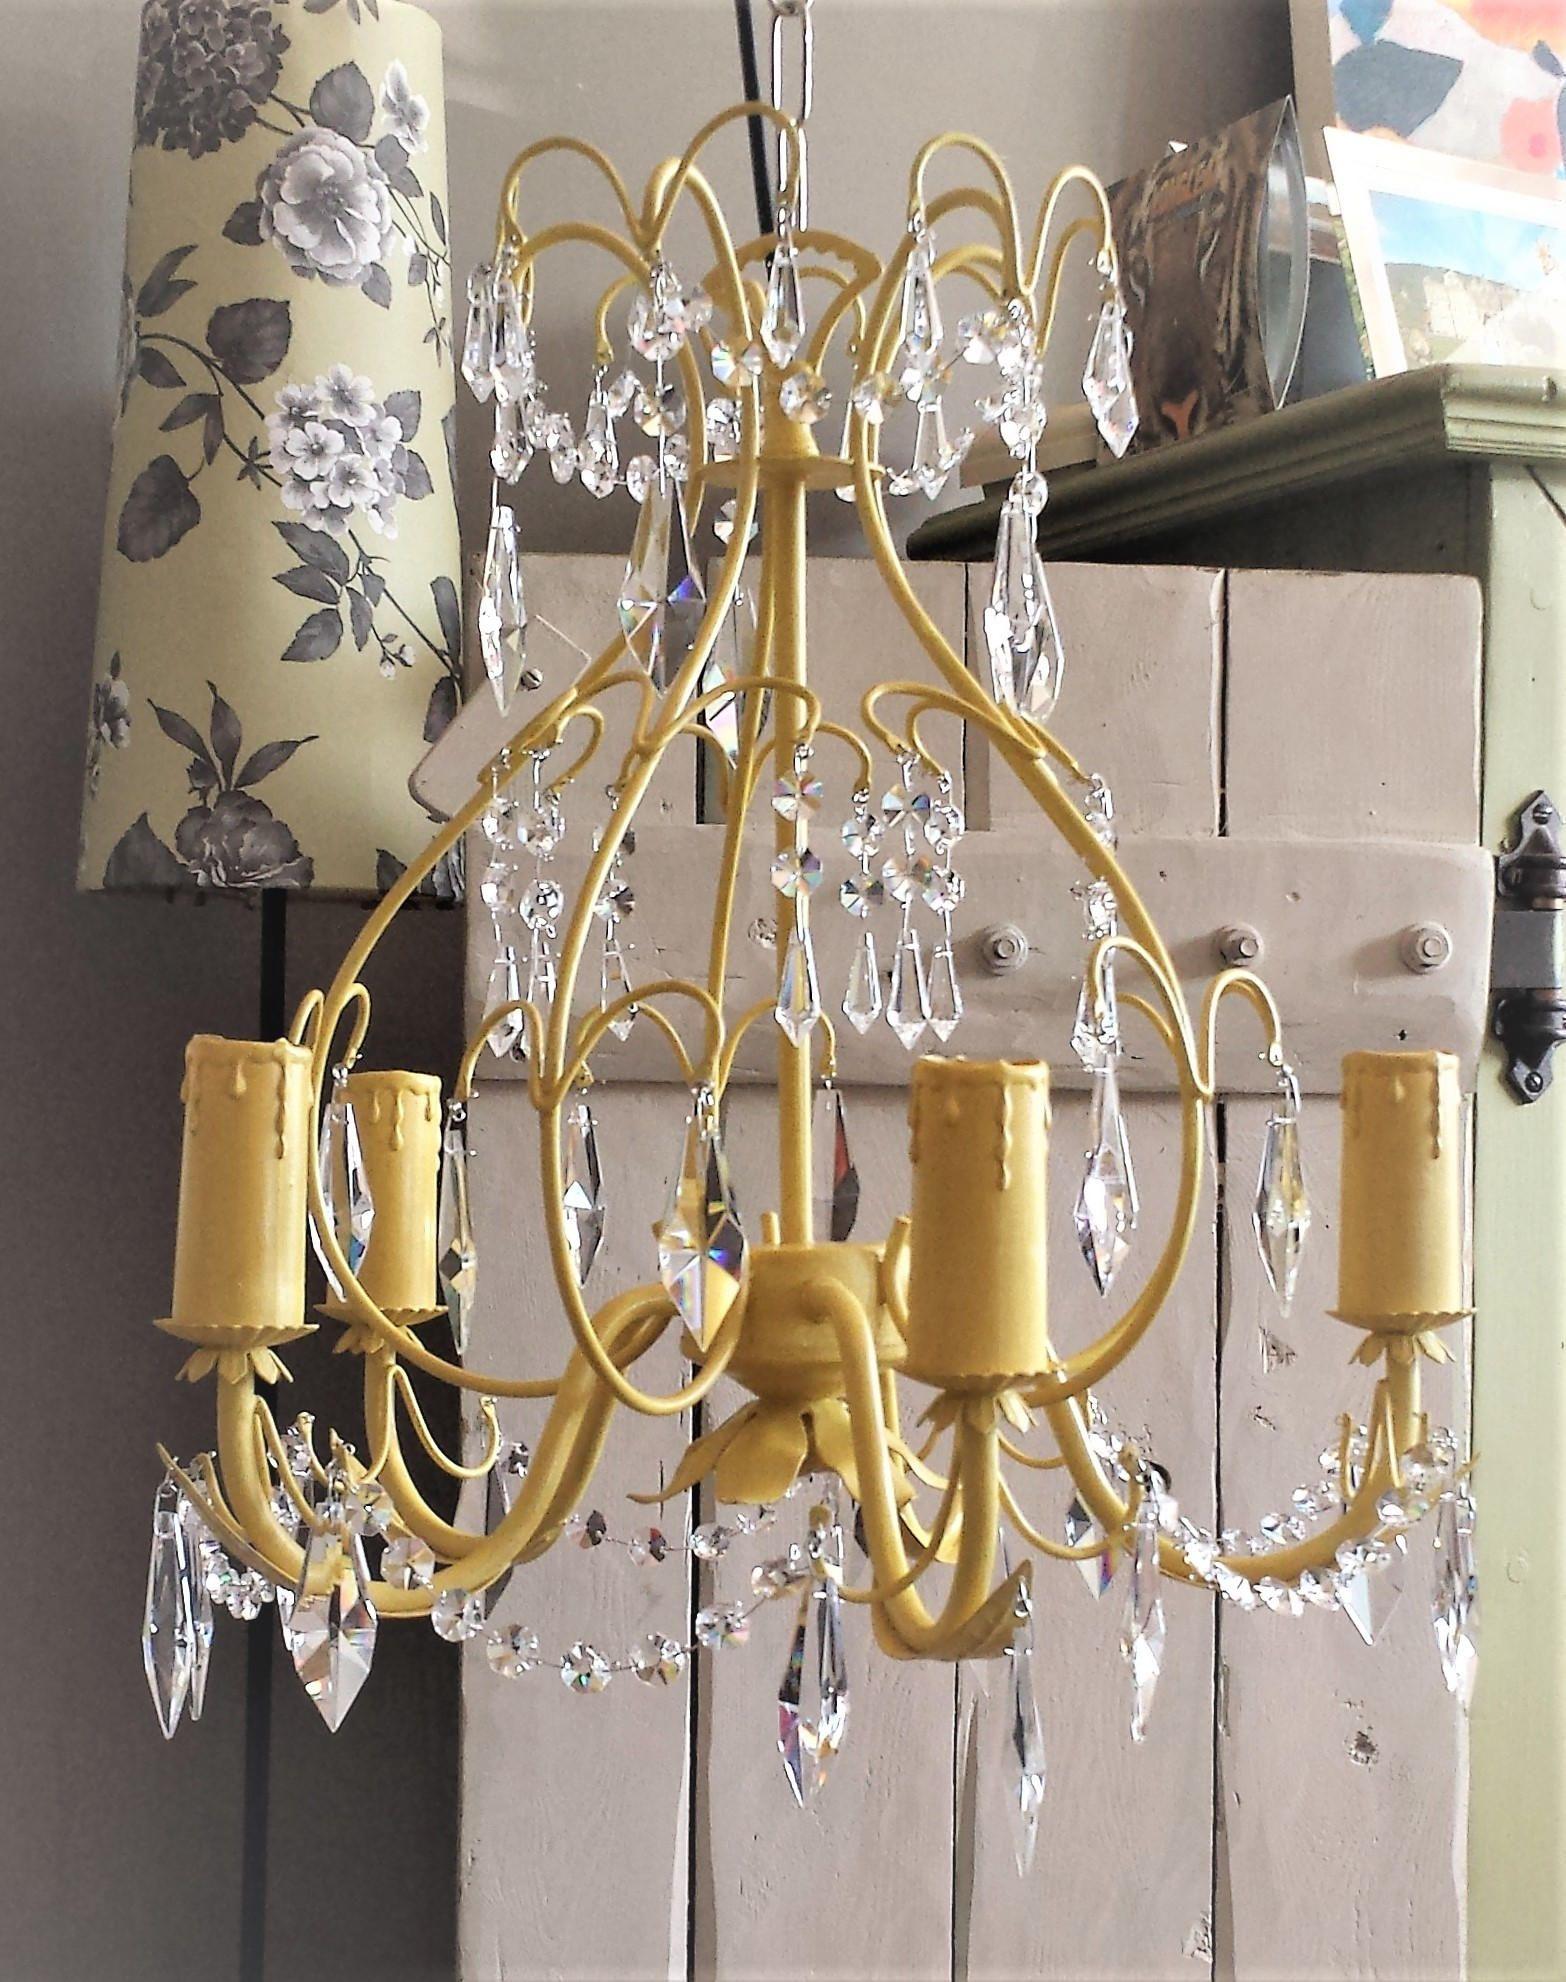 124d2b1f03 Crystal chandelier lighting, vintage crystal pendant lighting ...